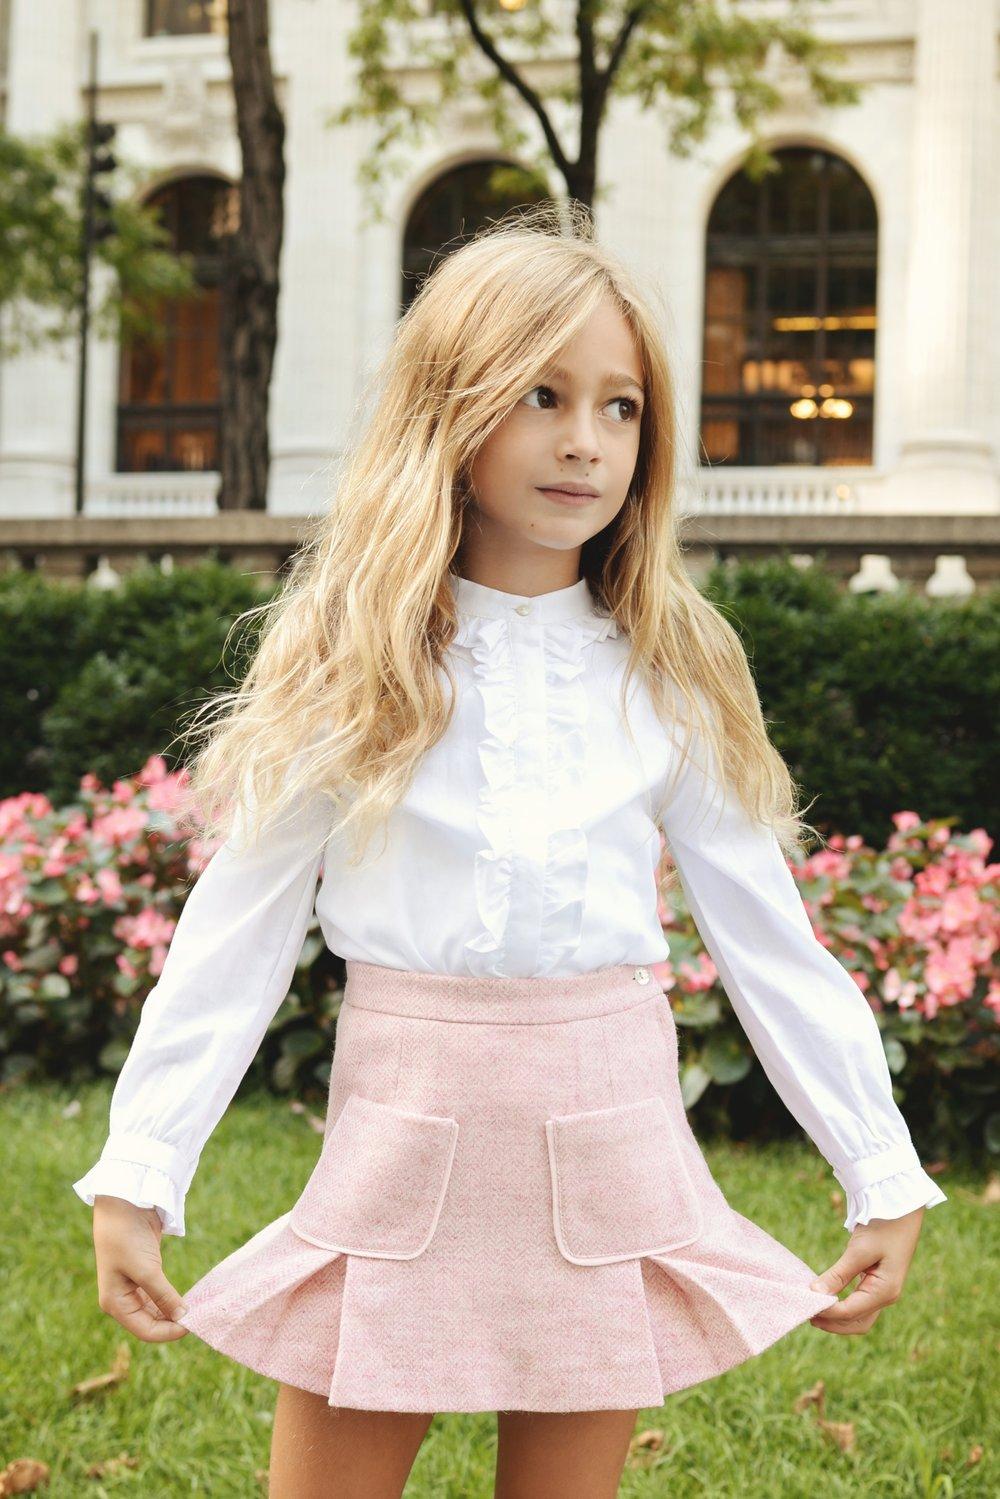 Enfant+Street+Style+by+Gina+Kim+Photography-48.jpeg